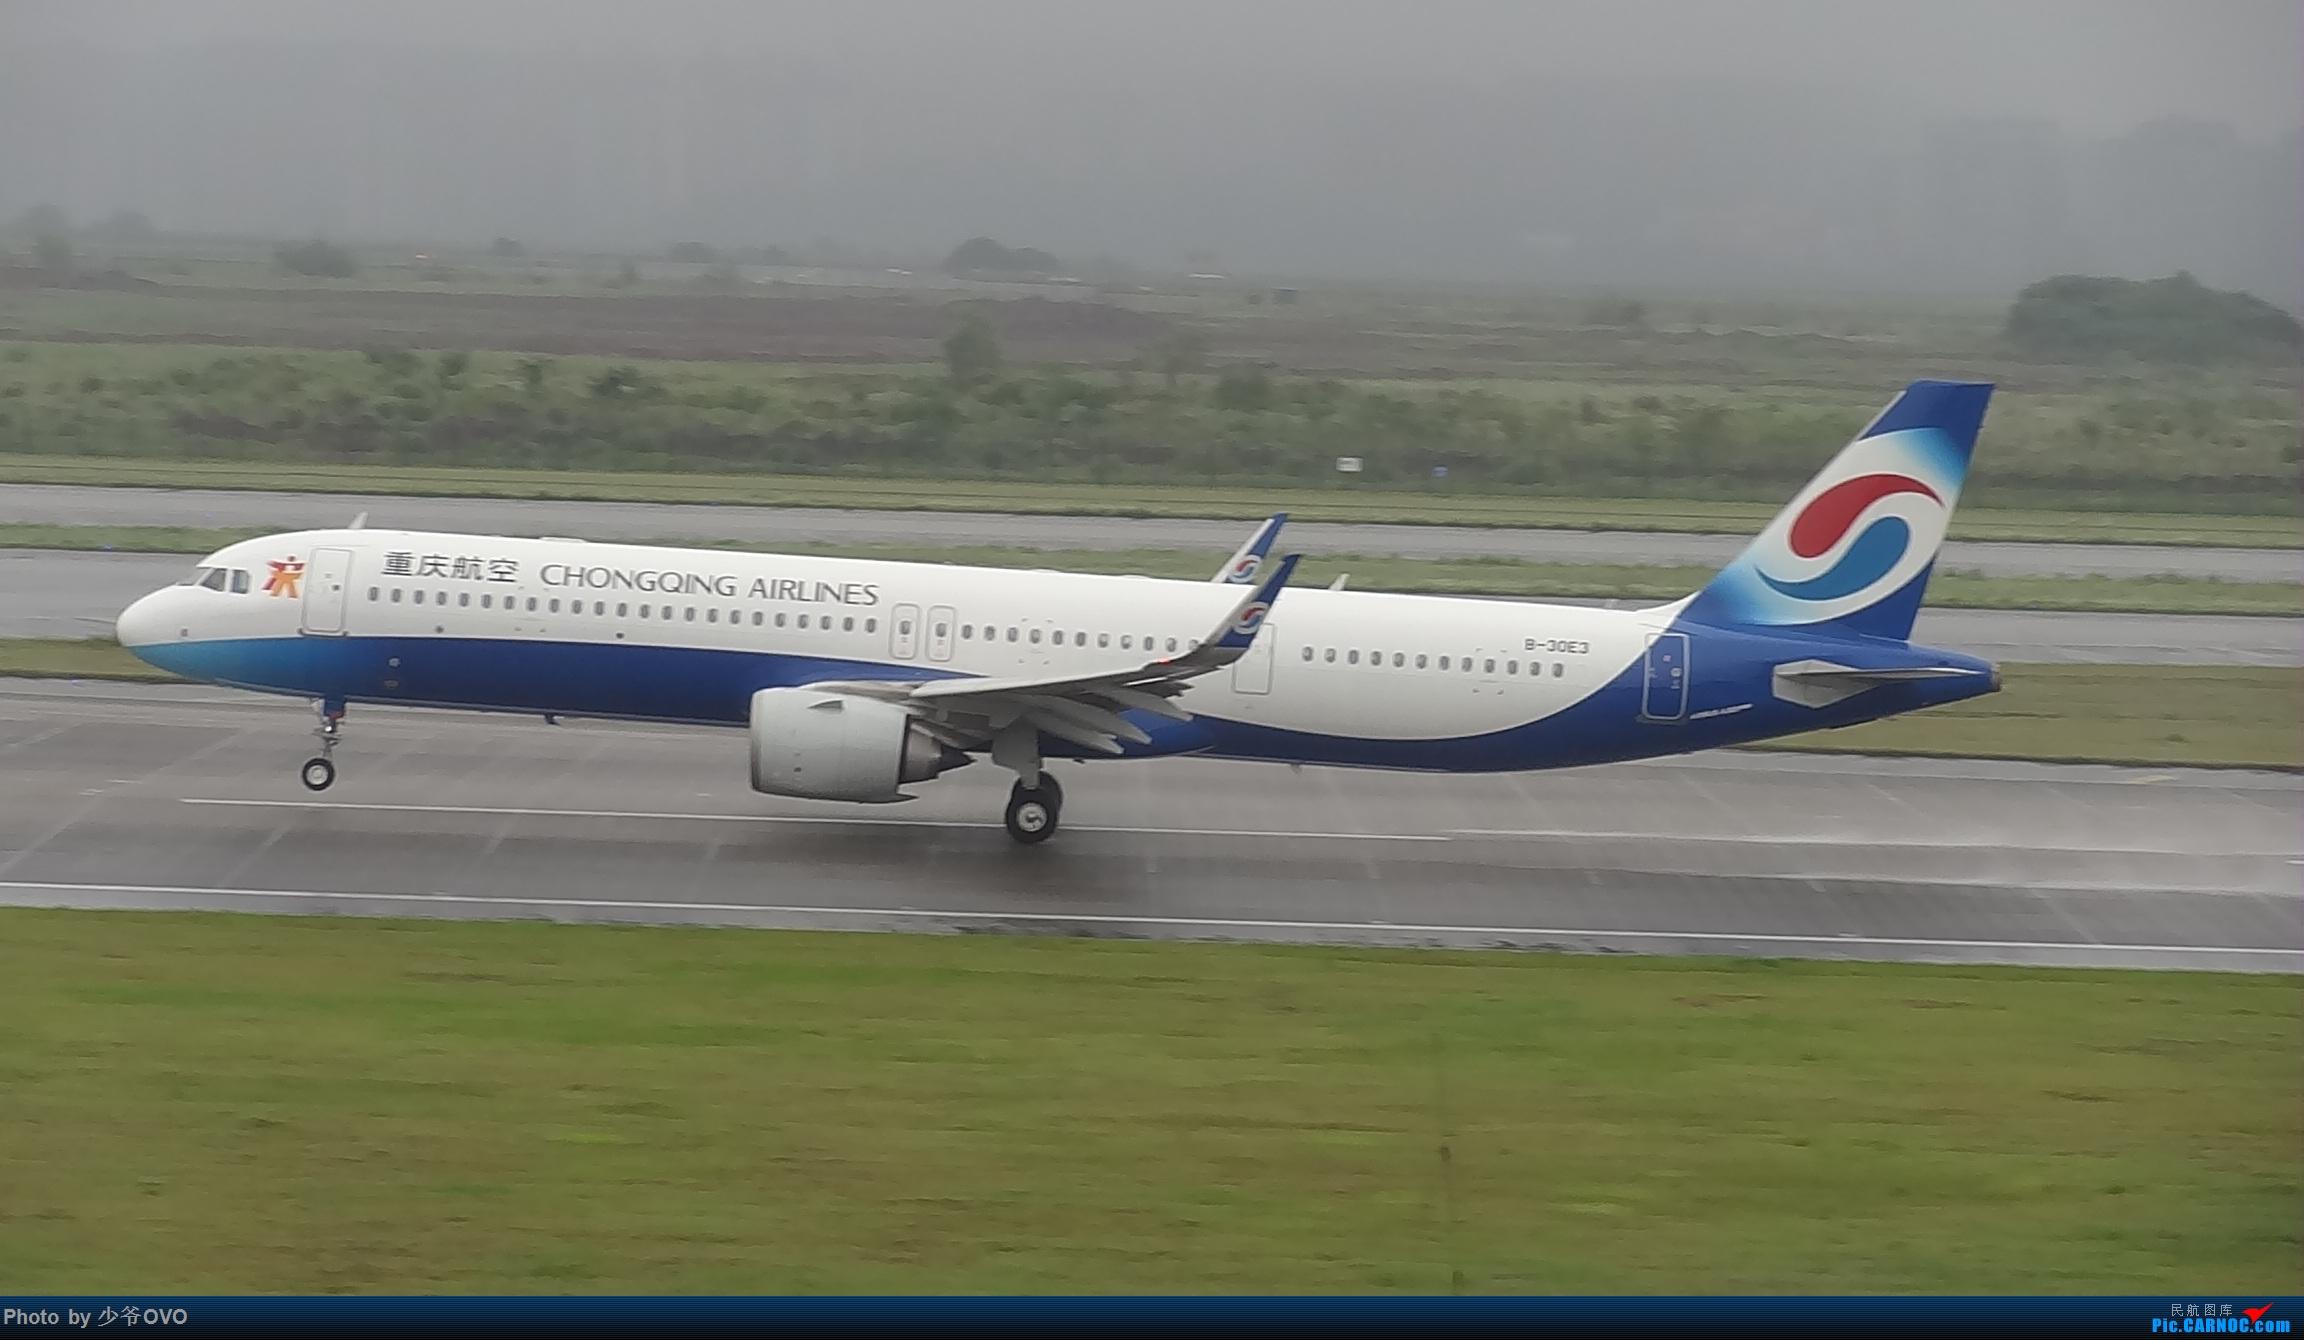 Re:[原创]CKG重庆江北机场拍机 ,中法建交50周年 AIRBUS A321 NEO ACF B-30E3 中国重庆江北国际机场